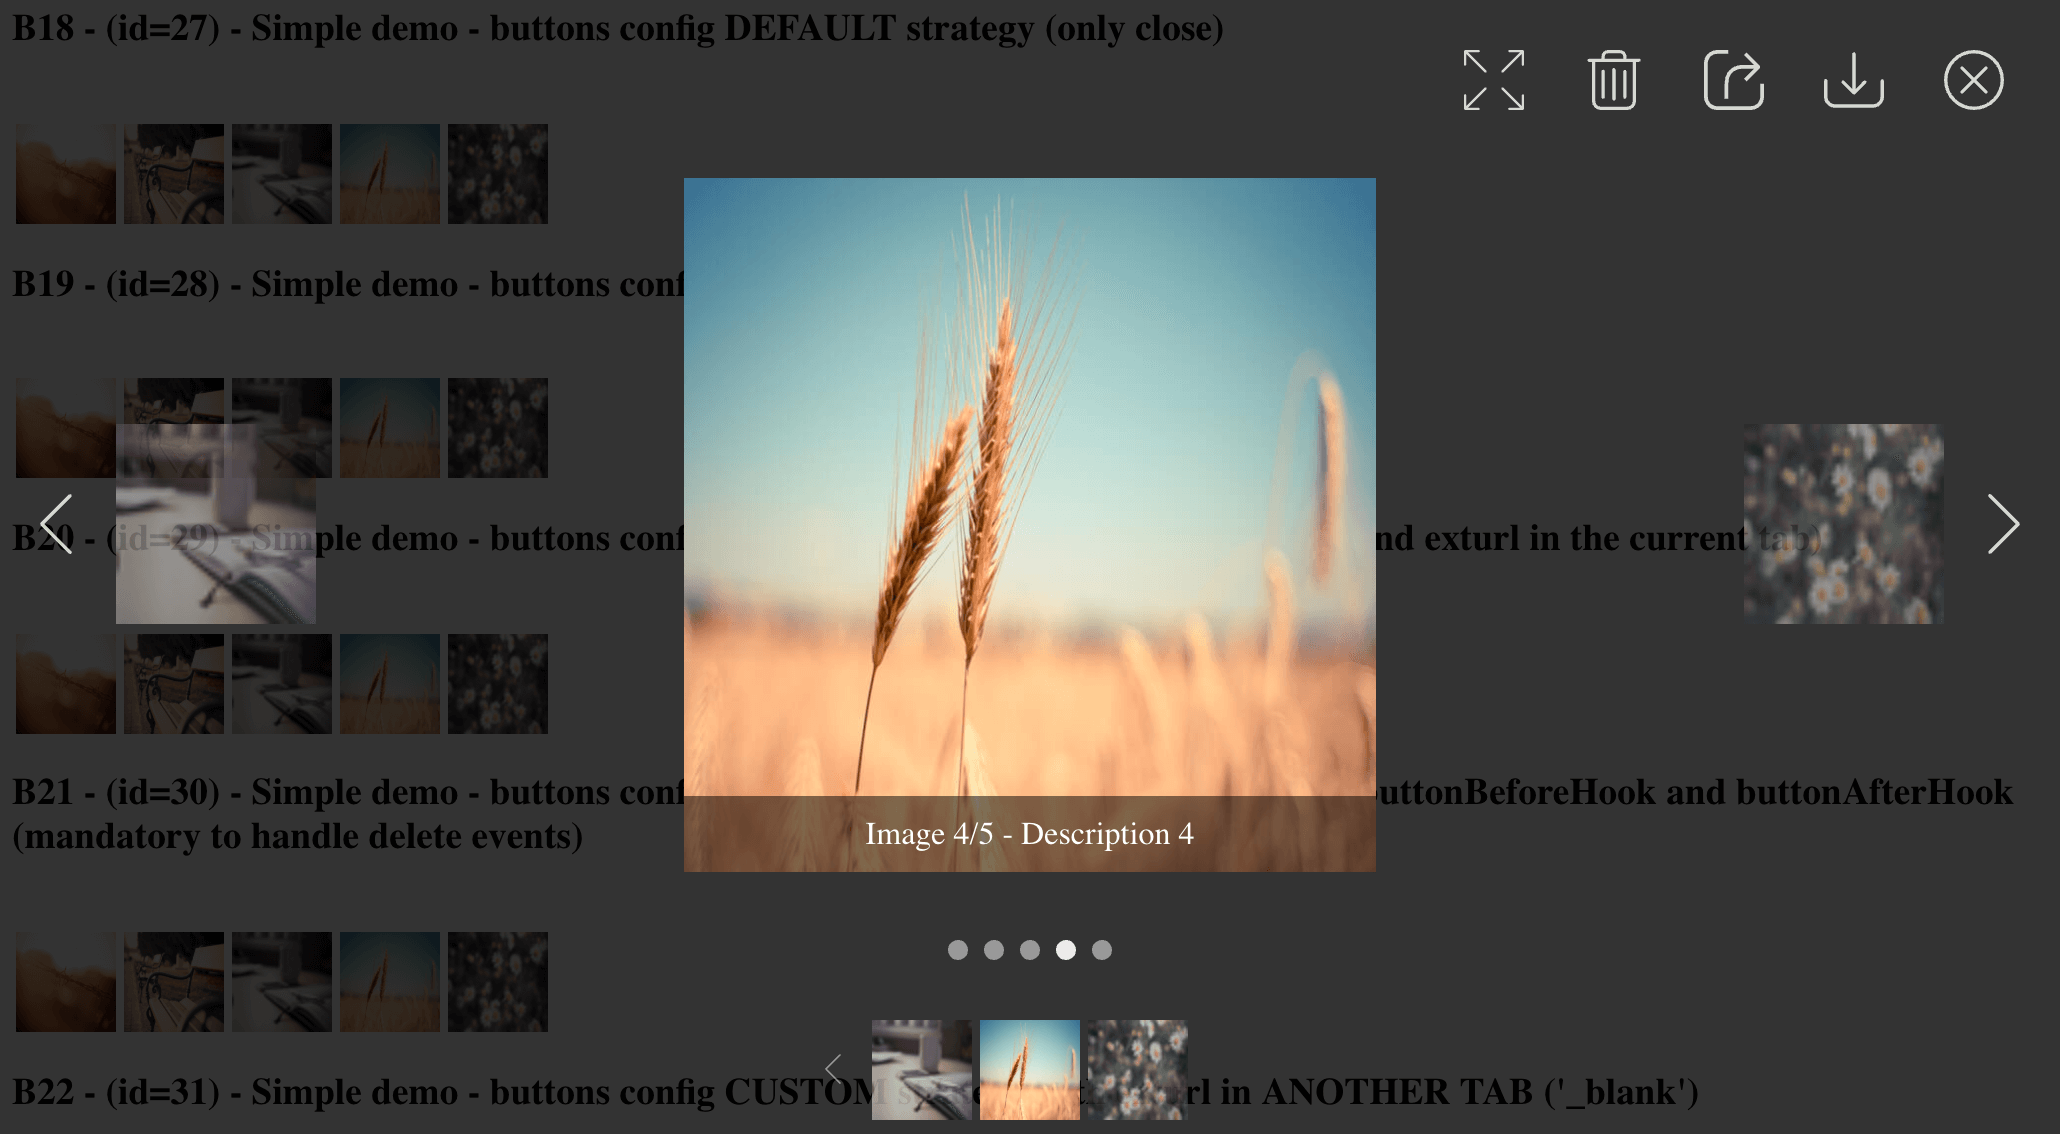 ks89/angular-modal-gallery - npm